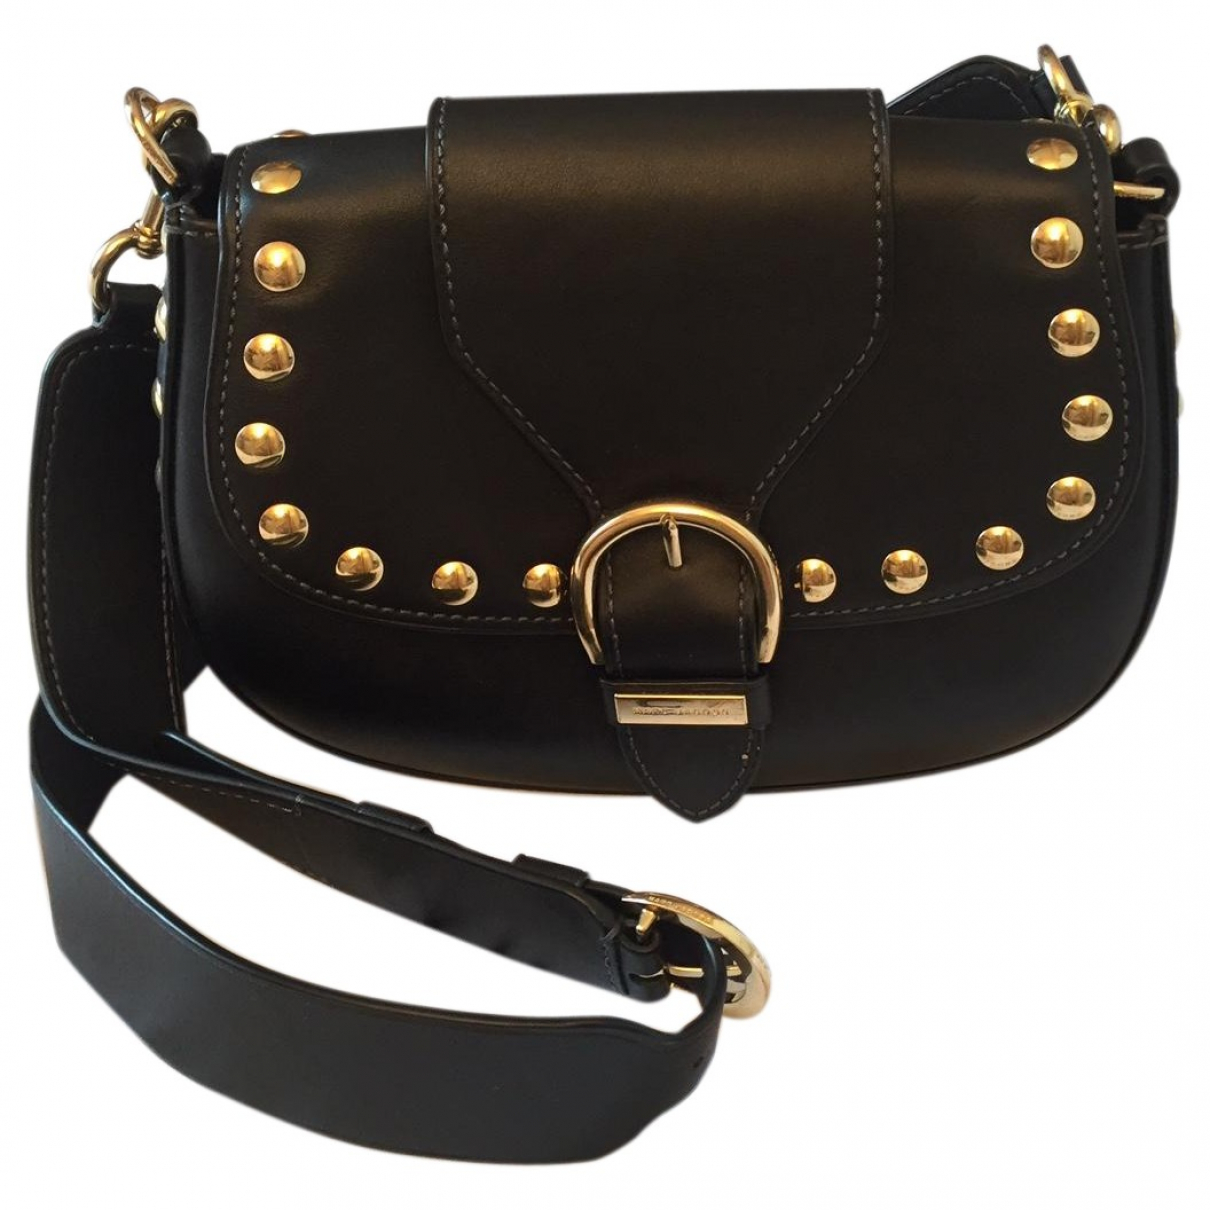 Marc Jacobs \N Black Leather handbag for Women \N